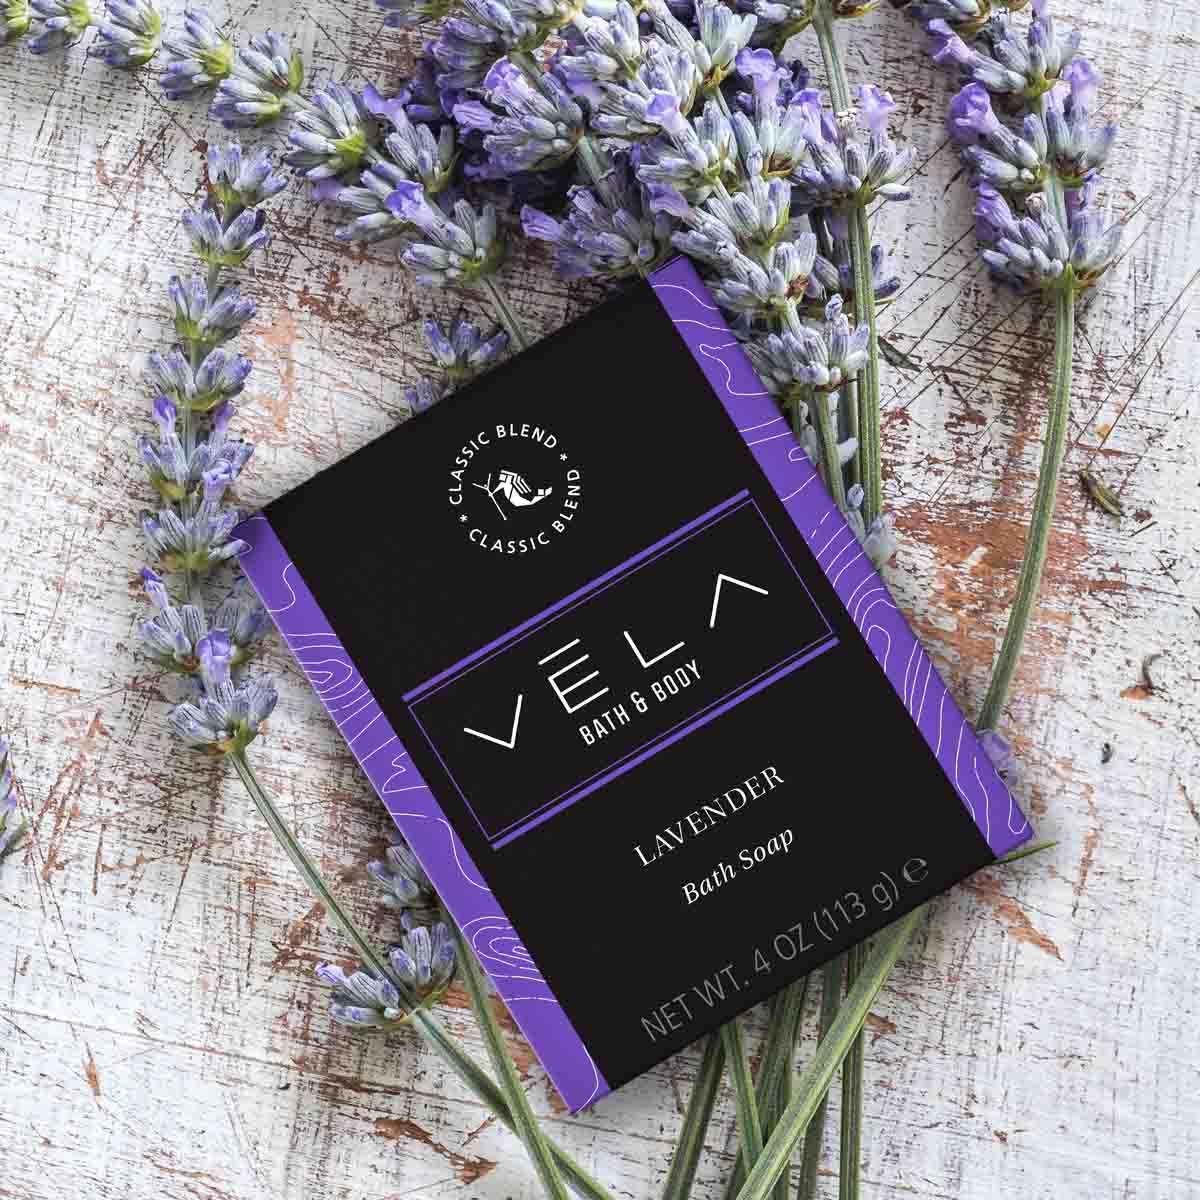 Vela-lavander-soap